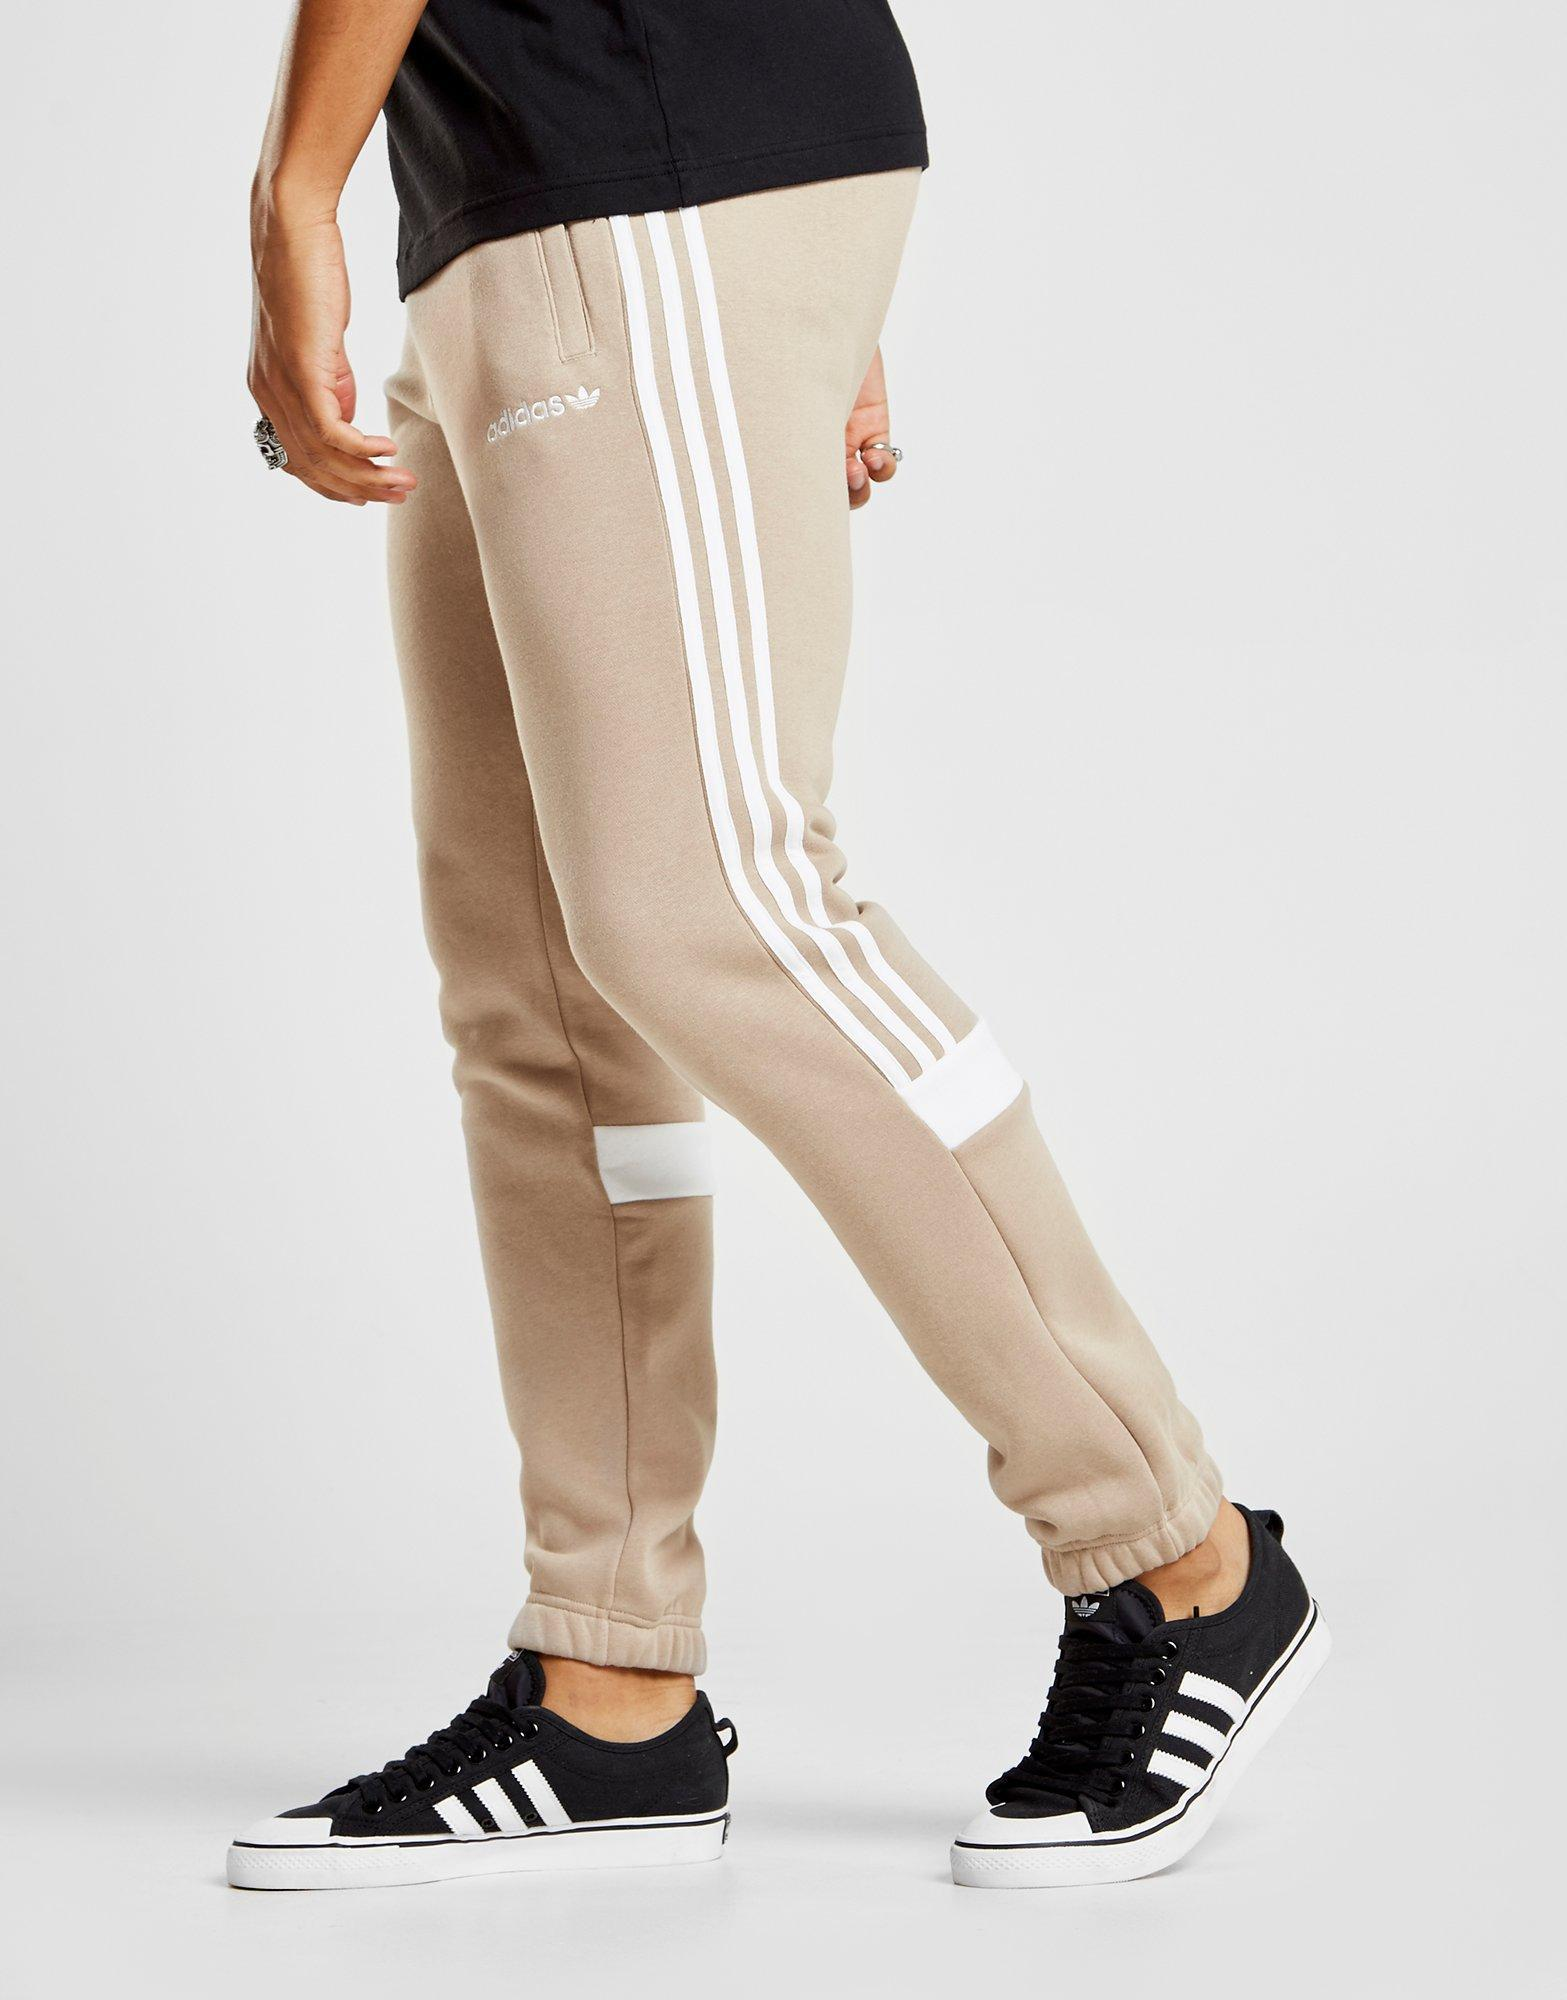 billig Adidas Originals Multicolor Itasca Fleece Track Pants for men